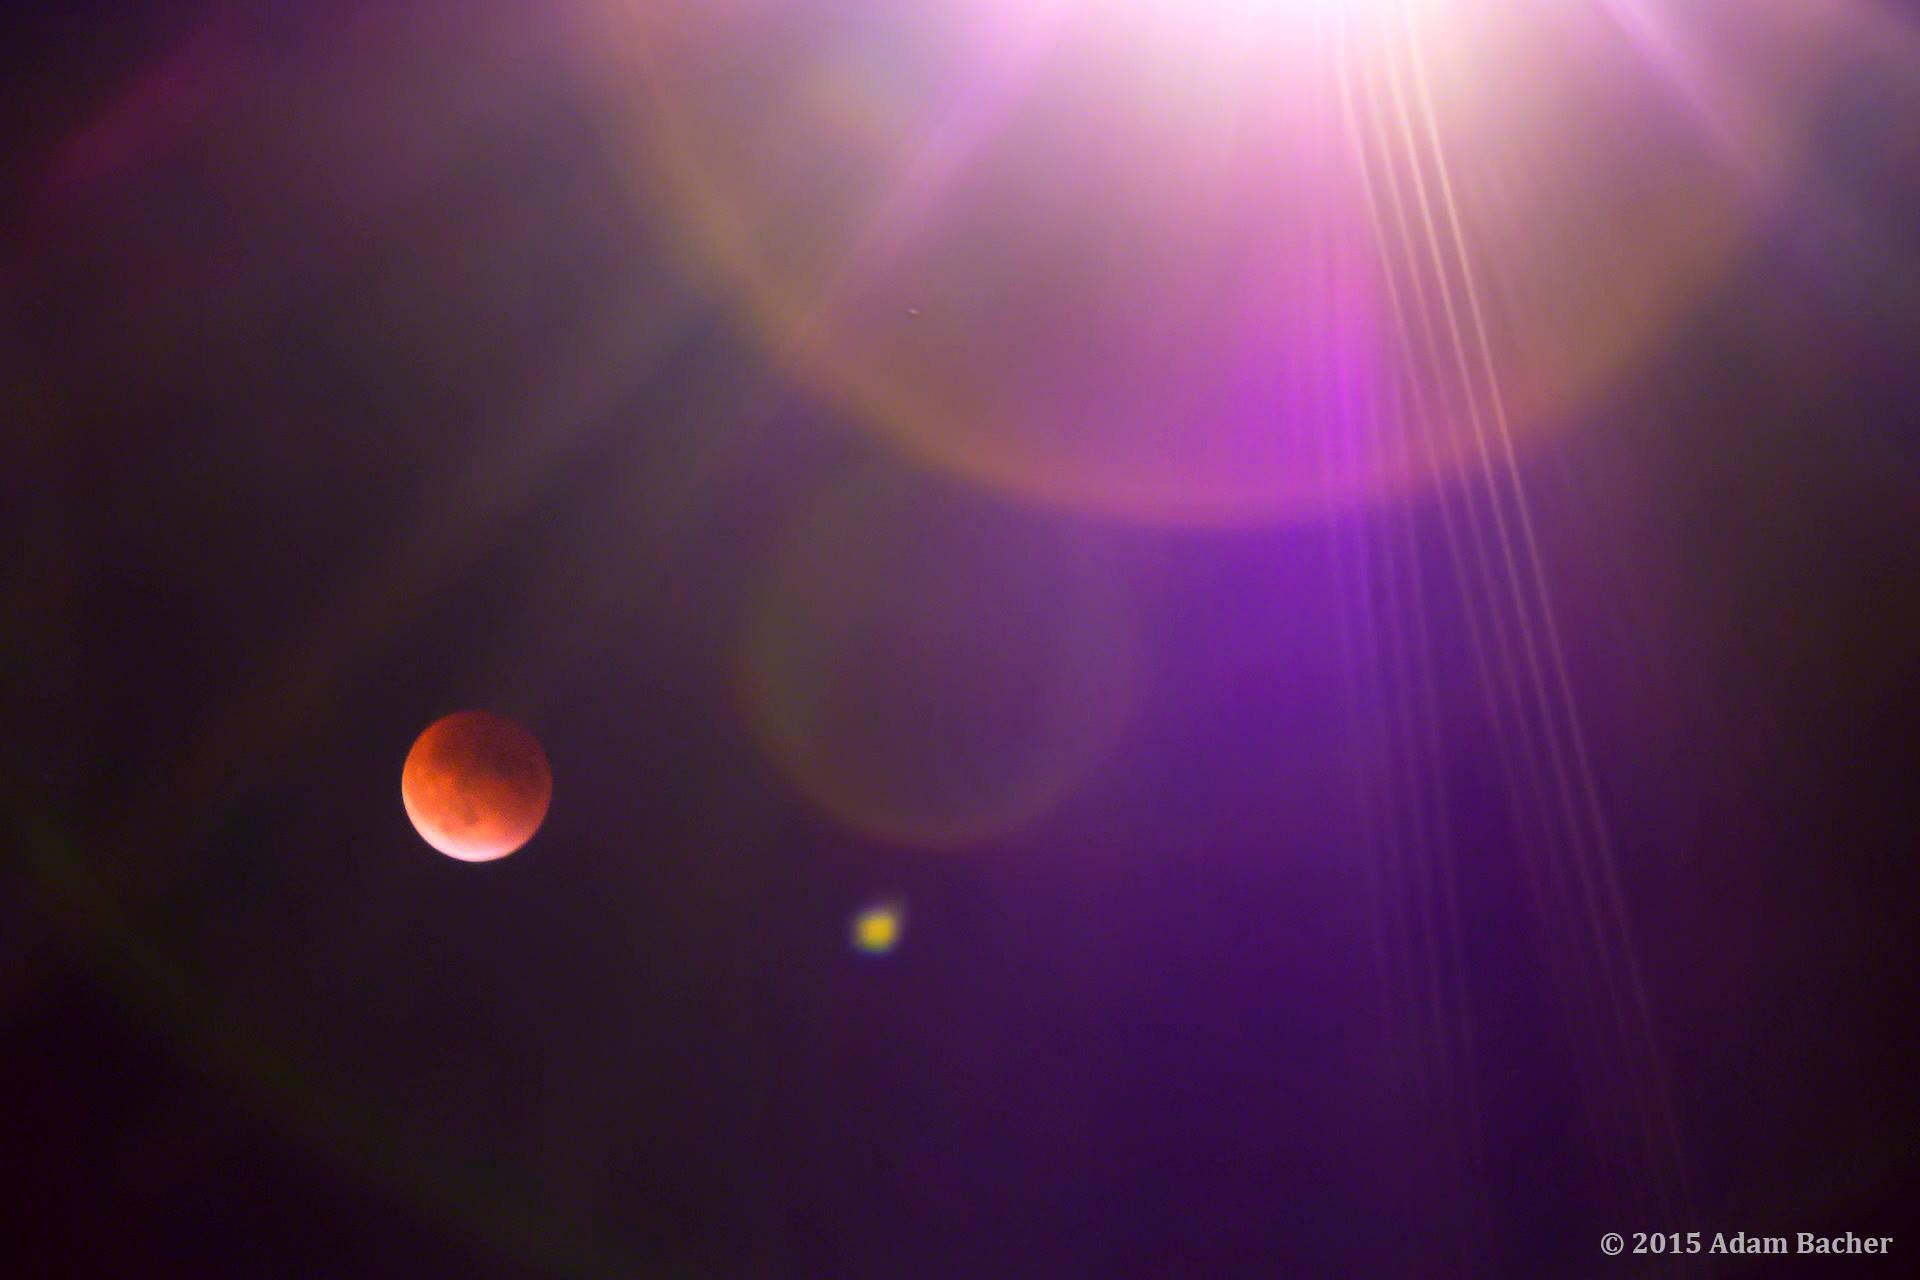 Blood moon lunar eclipse, taken by Portland Oregon editorial photographer Adam Bacher